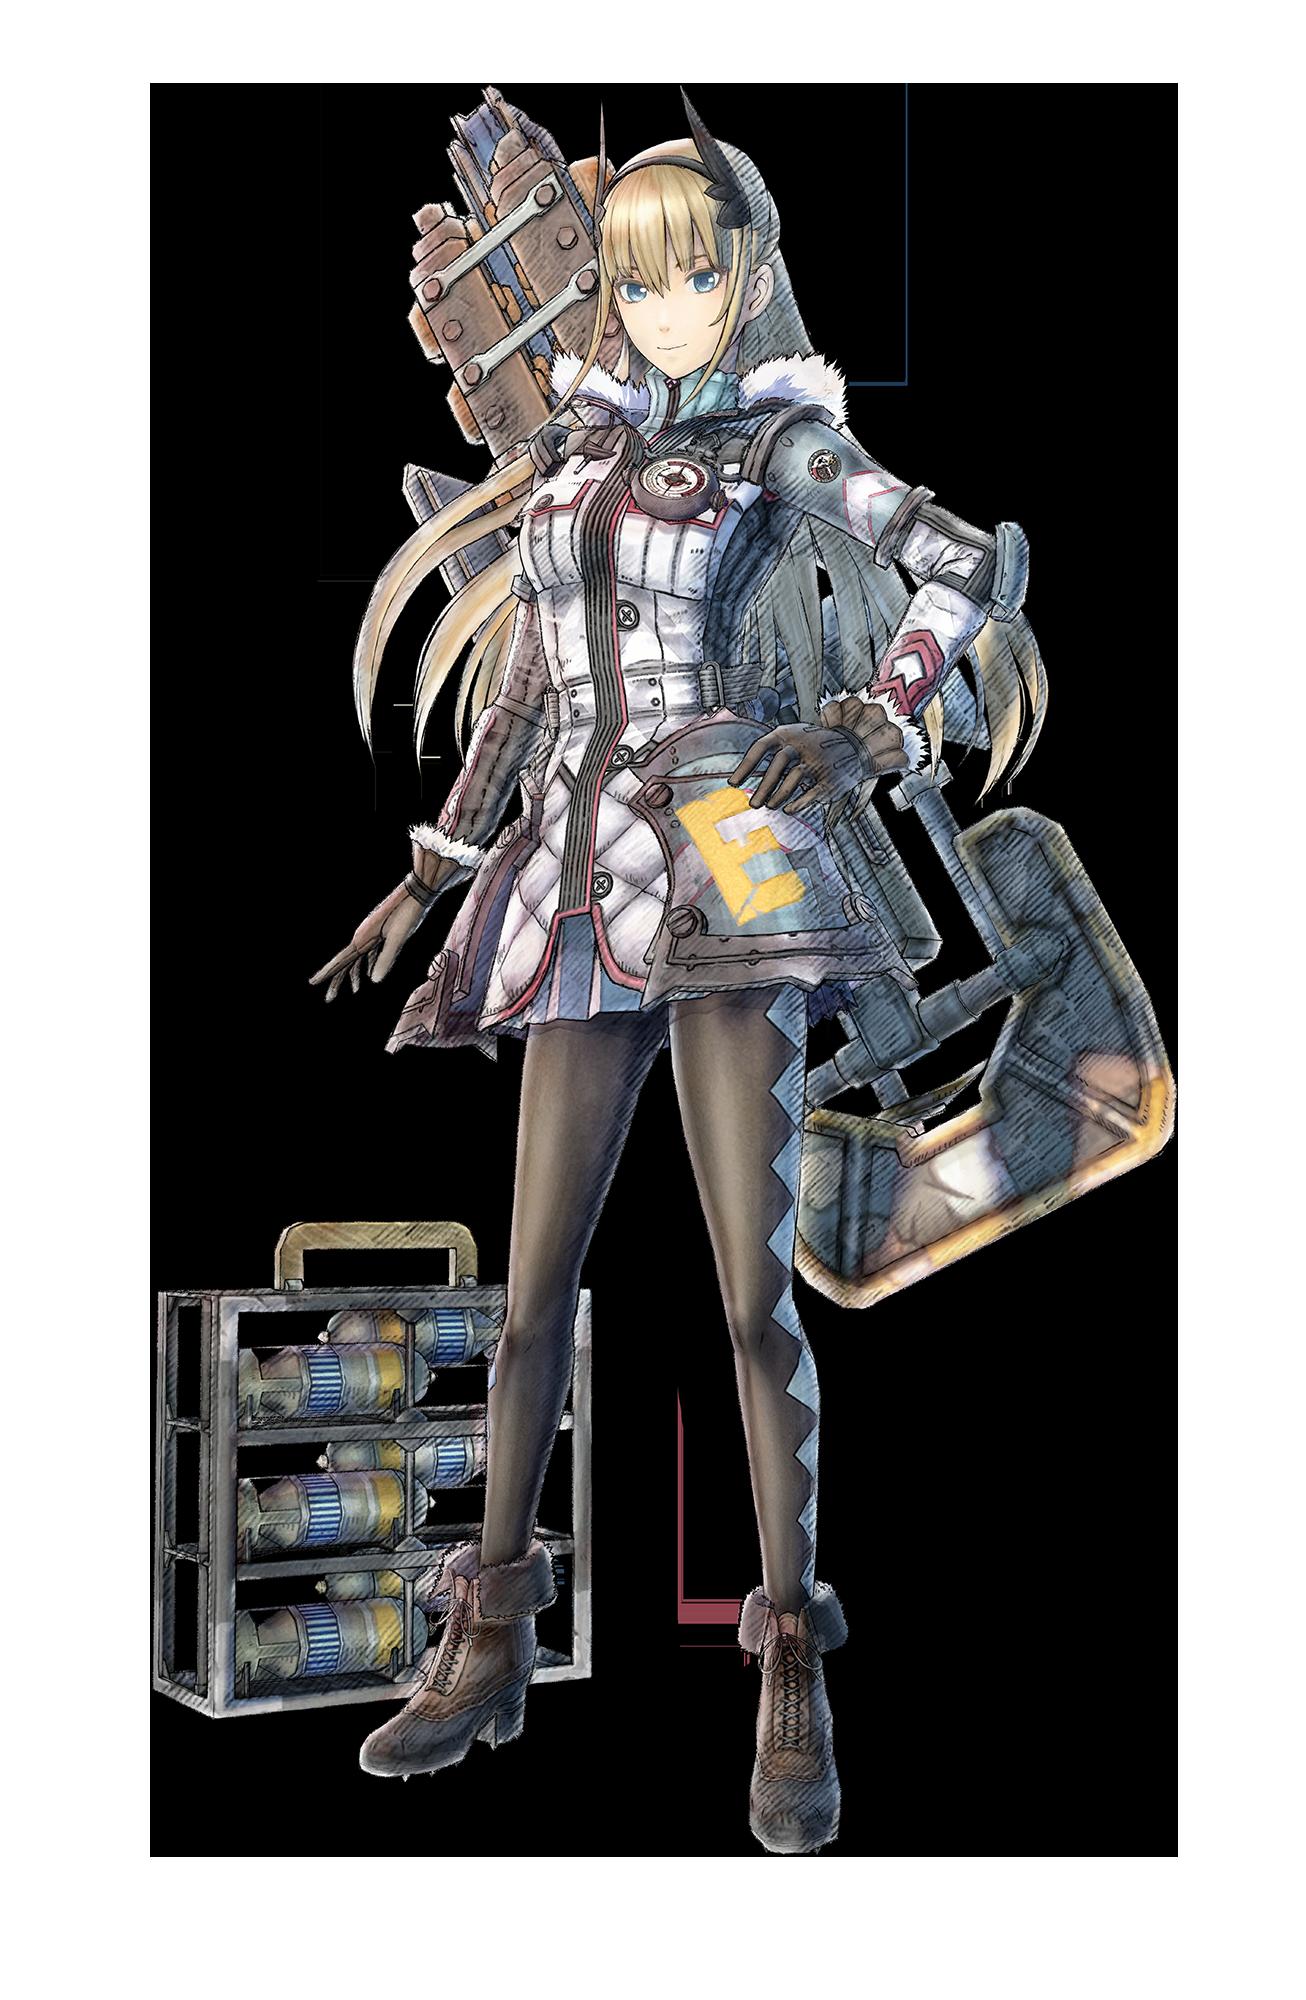 Valkyria Chronicles 4 Character Art 2